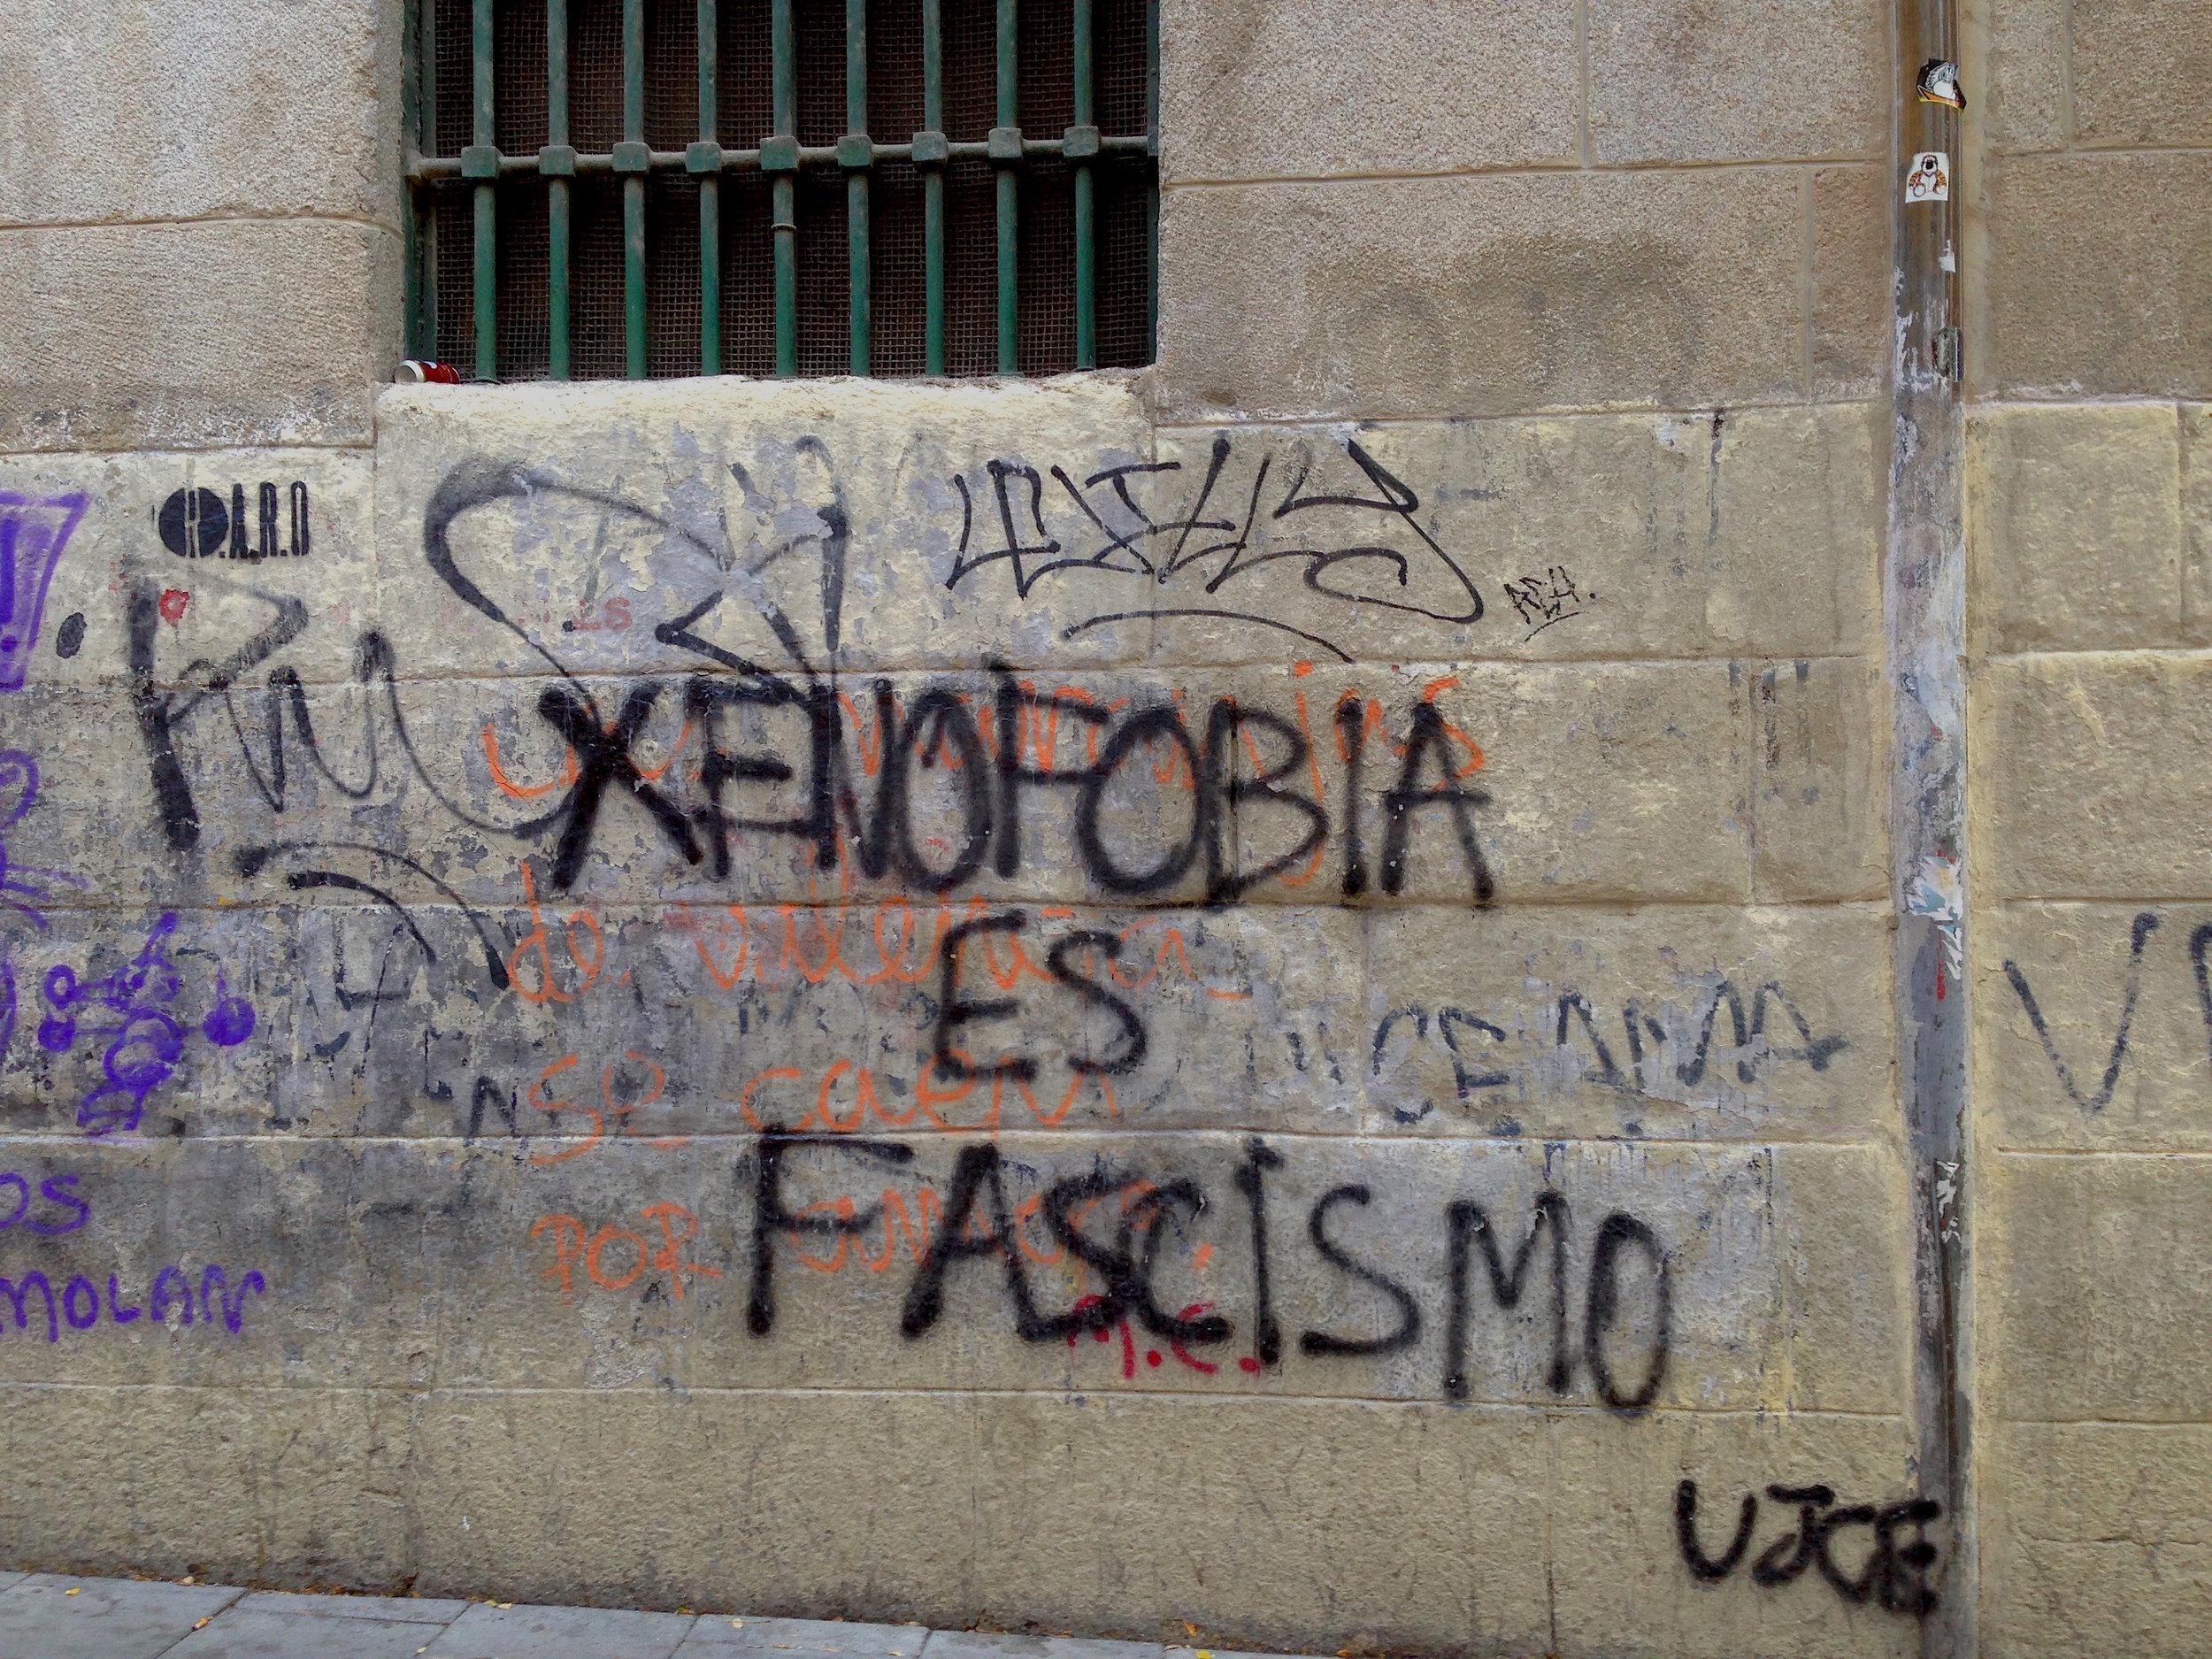 Xenophobia is Fascism.